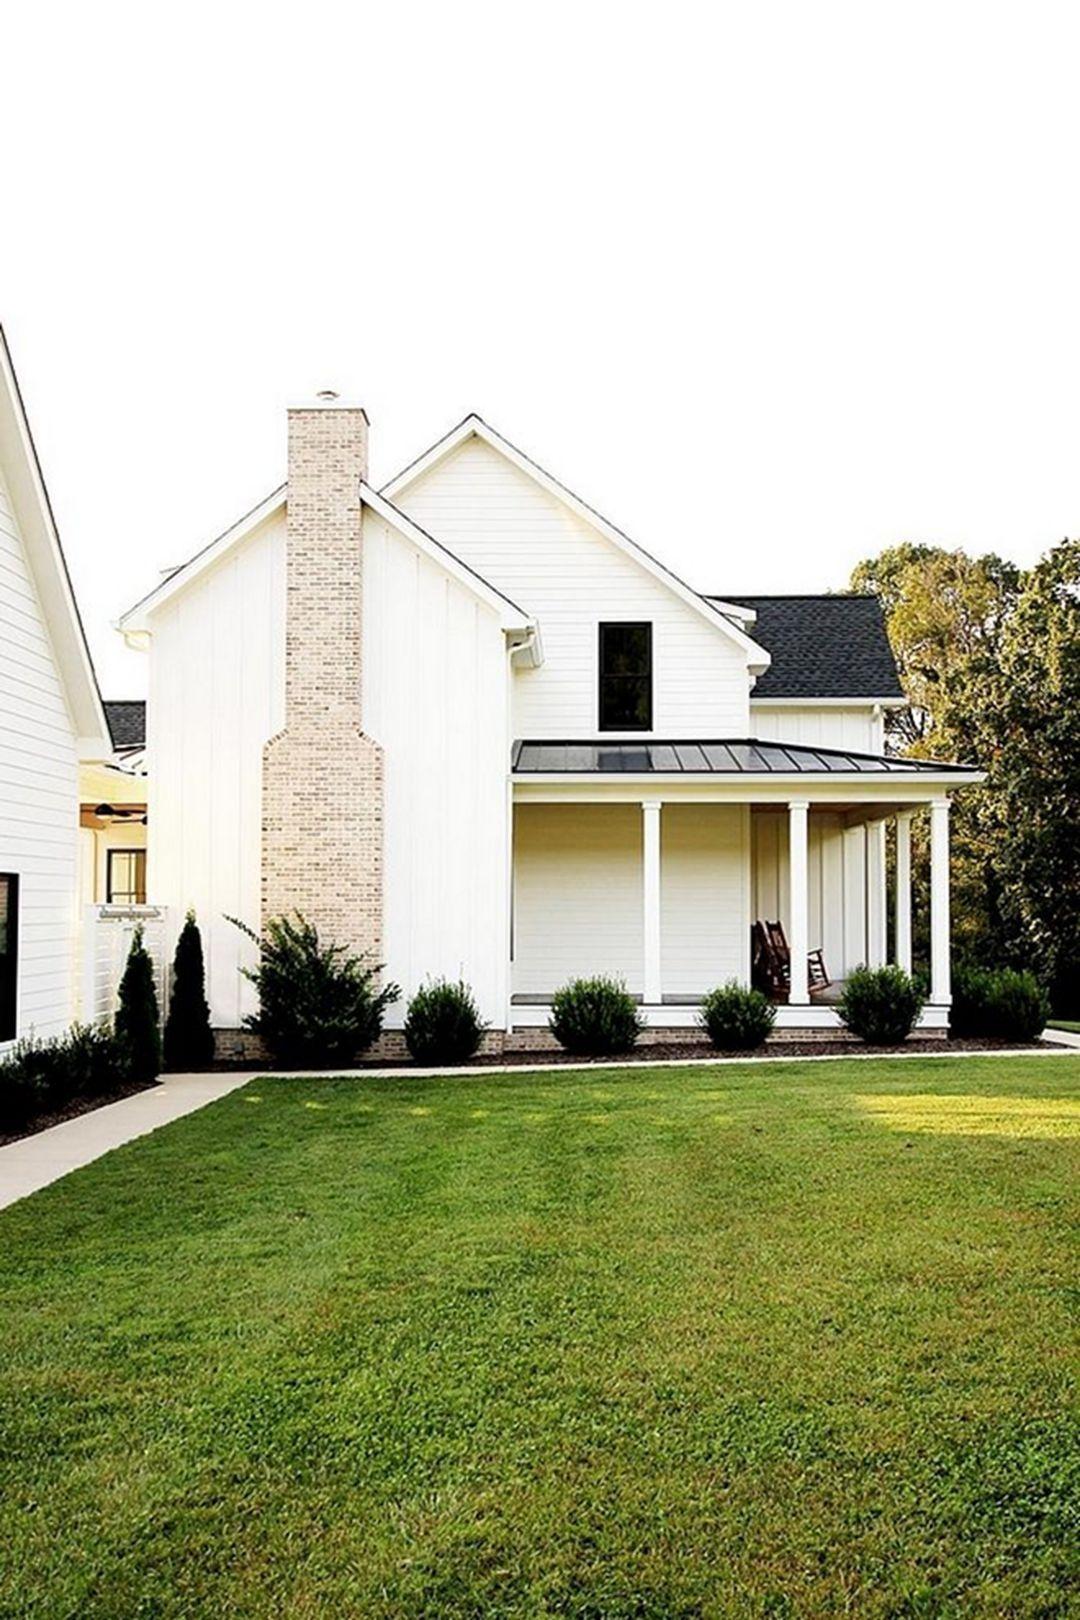 unique farmhouse exterior design ideas for your home also decor idea designs rh ar pinterest